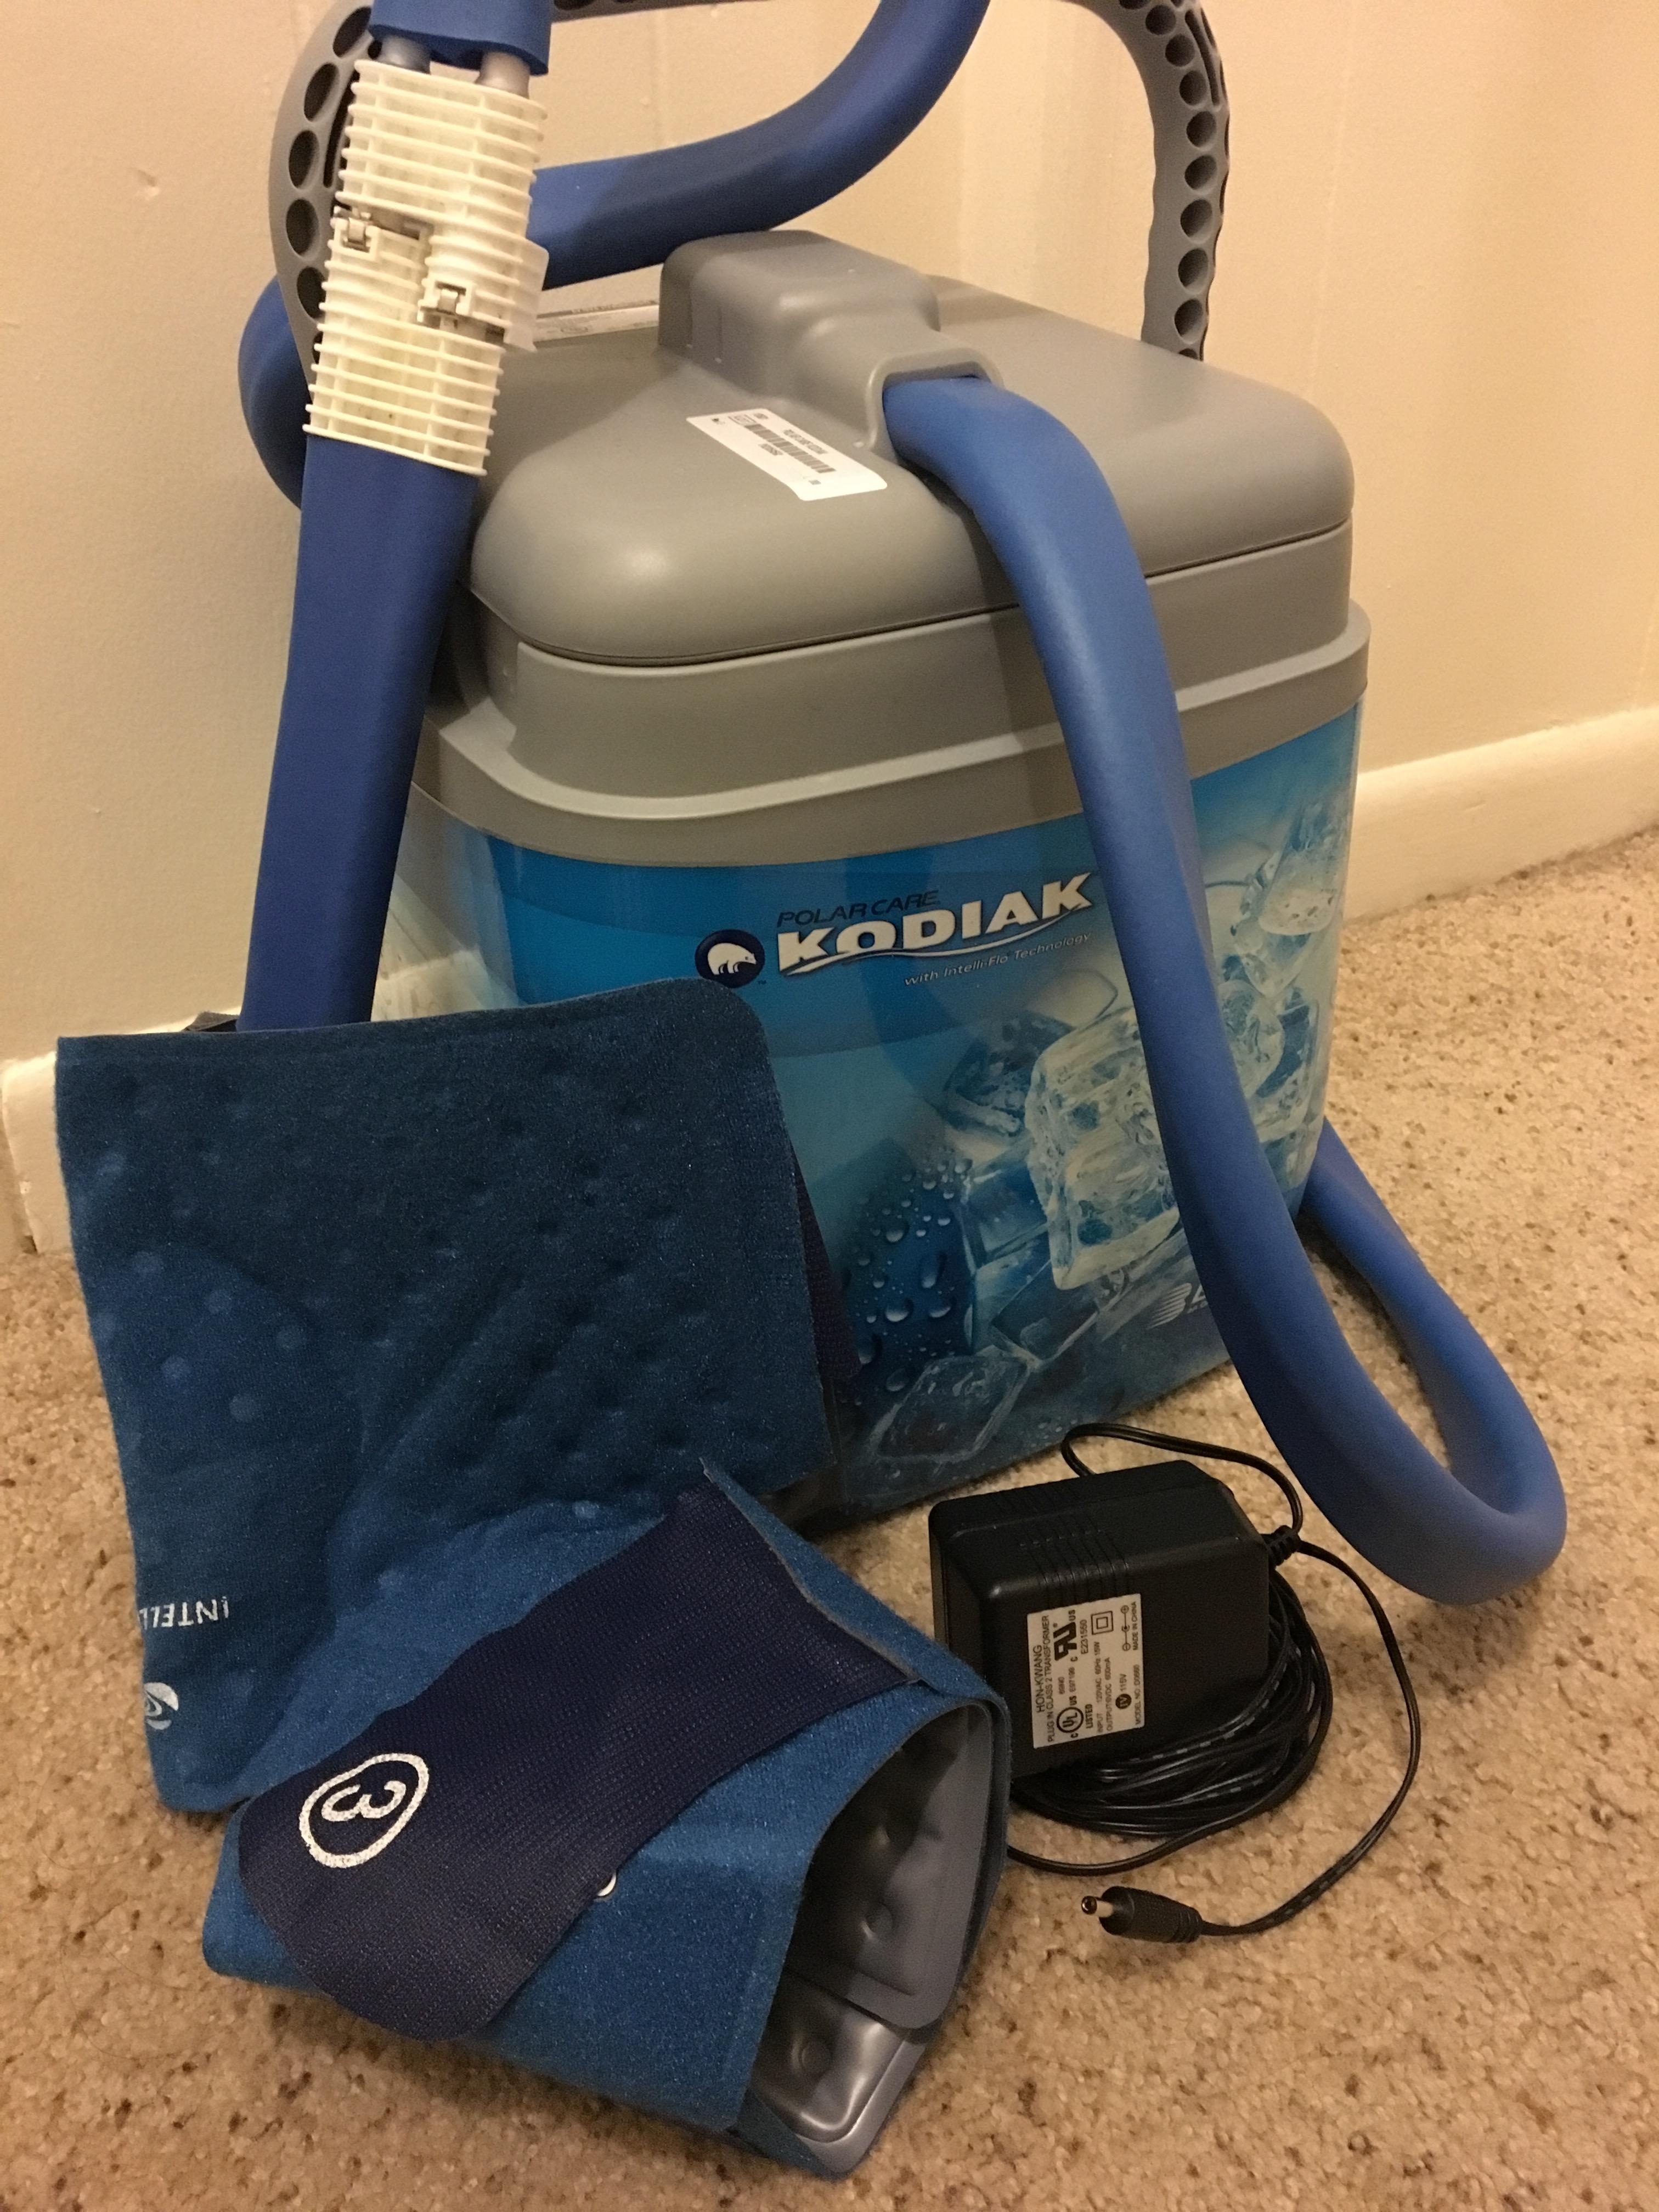 kodiak cold therapy machine